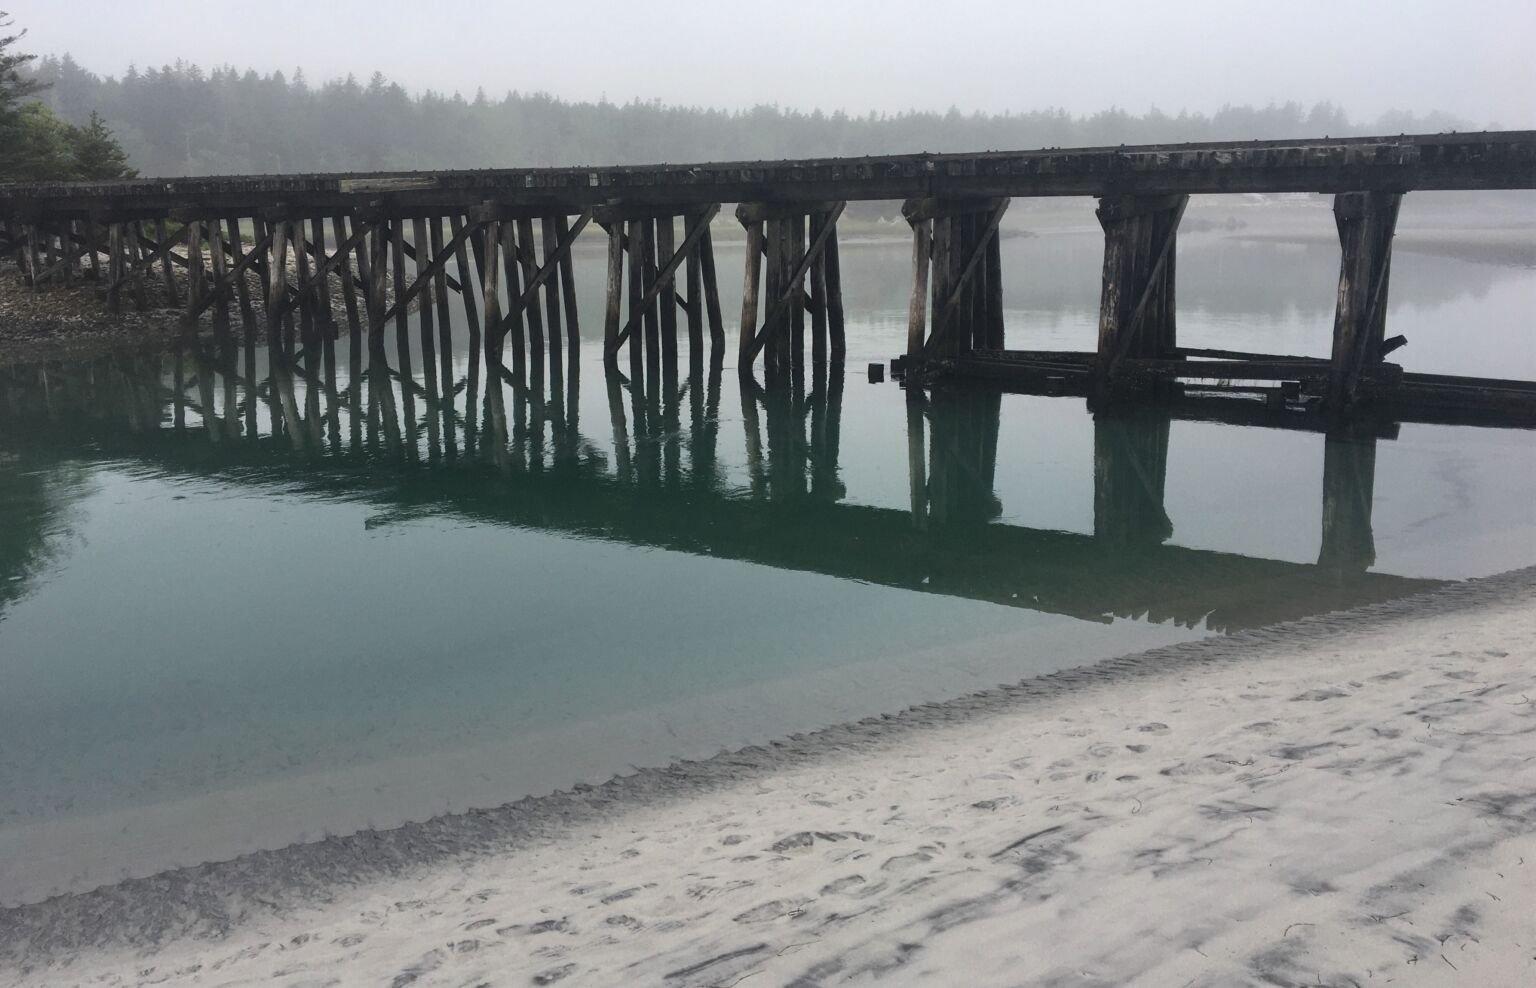 Old train trestle by a beach